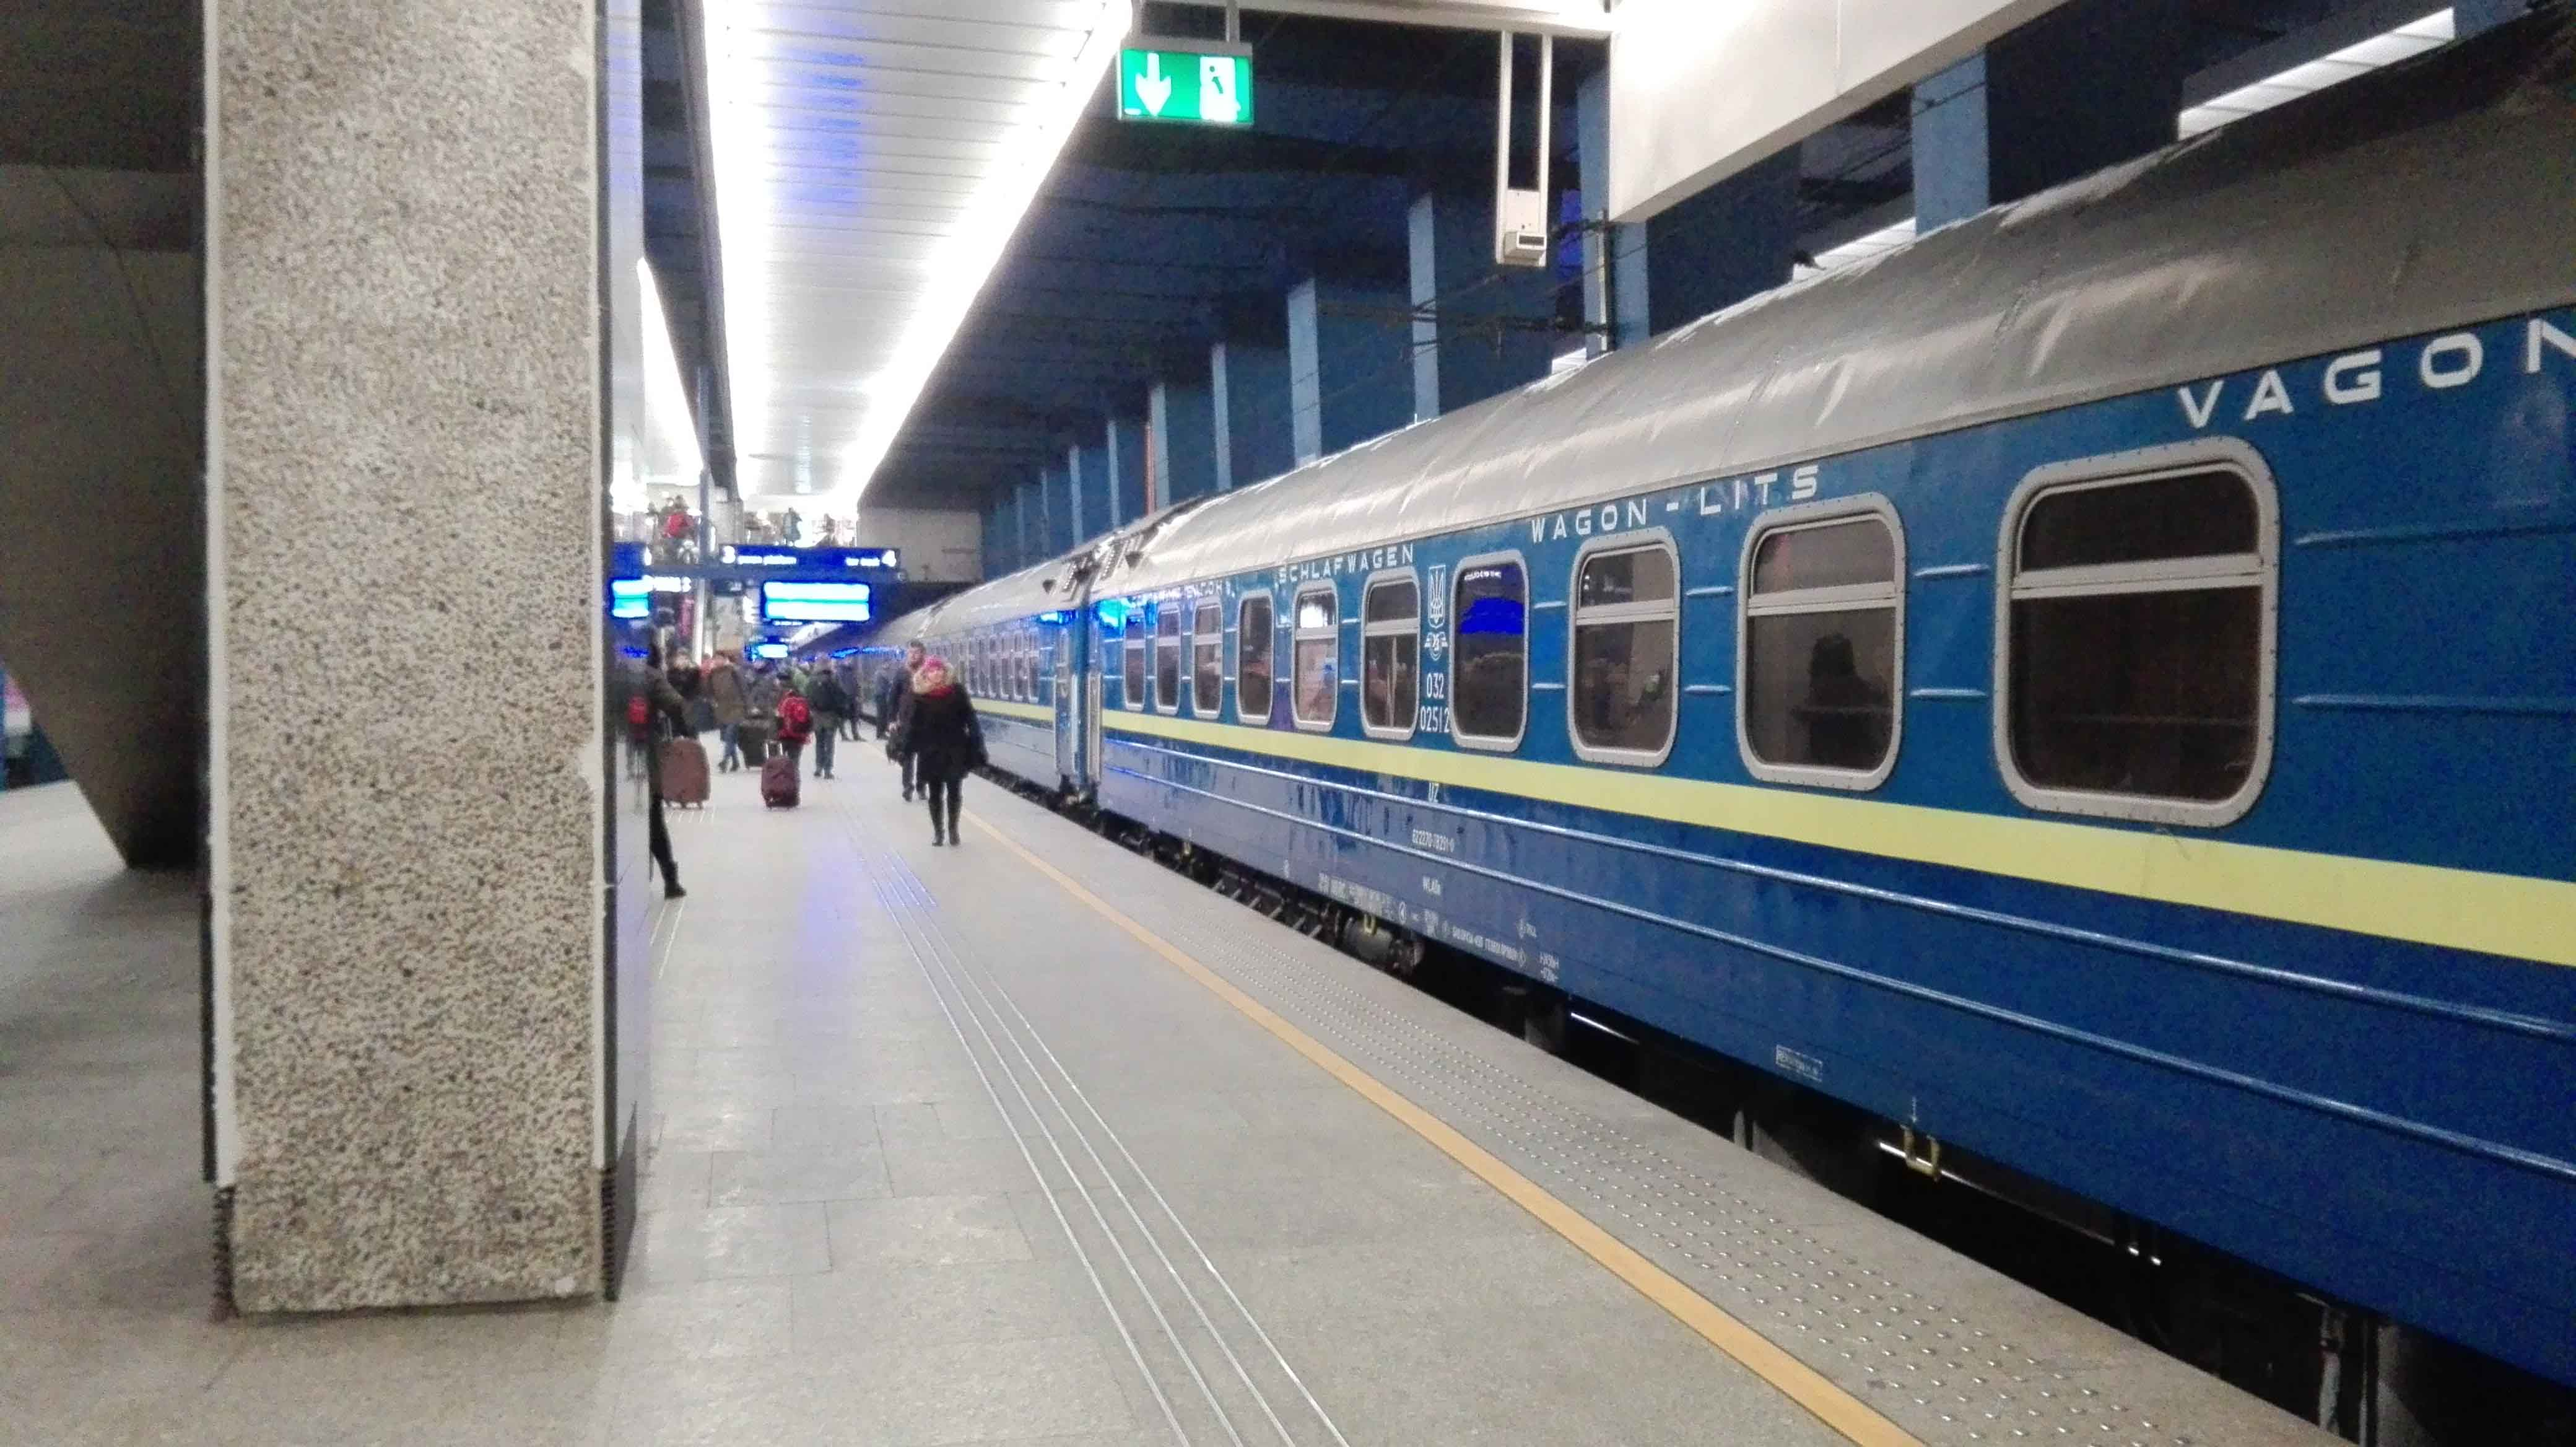 Билет киев варшава купить билет на поезд купить билет в москву на самолет